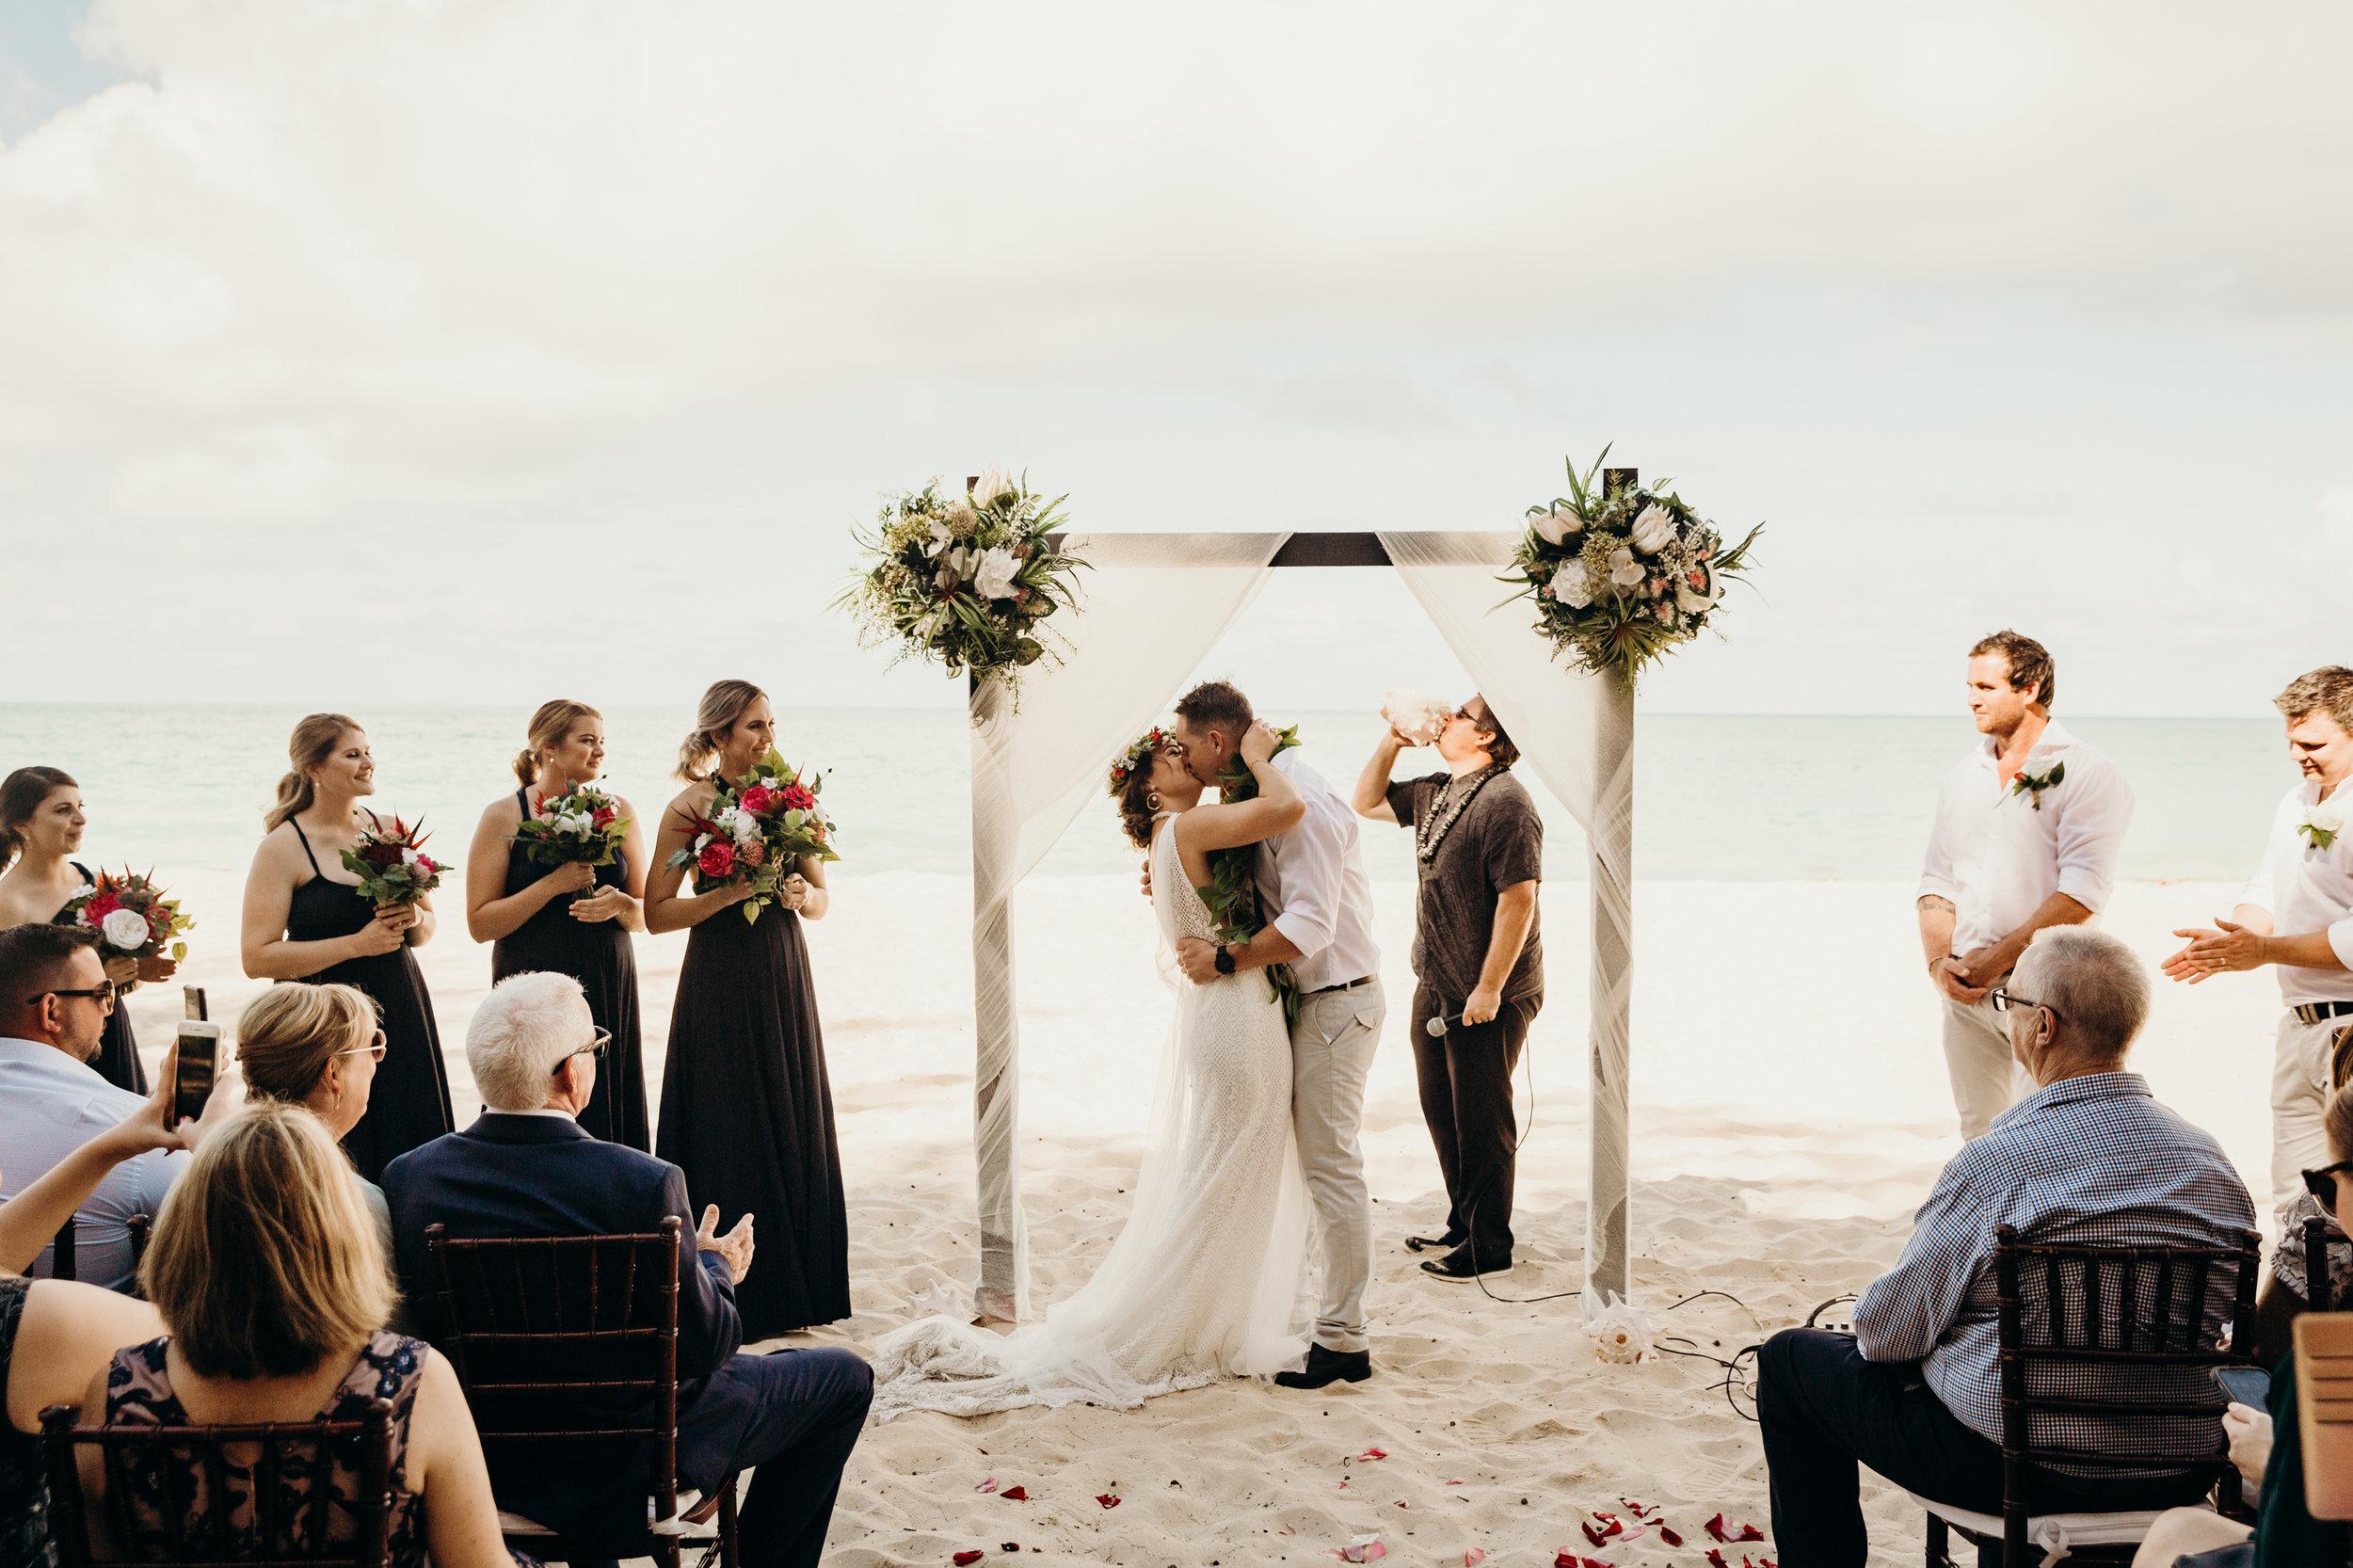 HAWAII-WEDDING-PHOTOGRAPHER-ALOHILANI-RESORT-KEANI-BAKULA-34.jpg